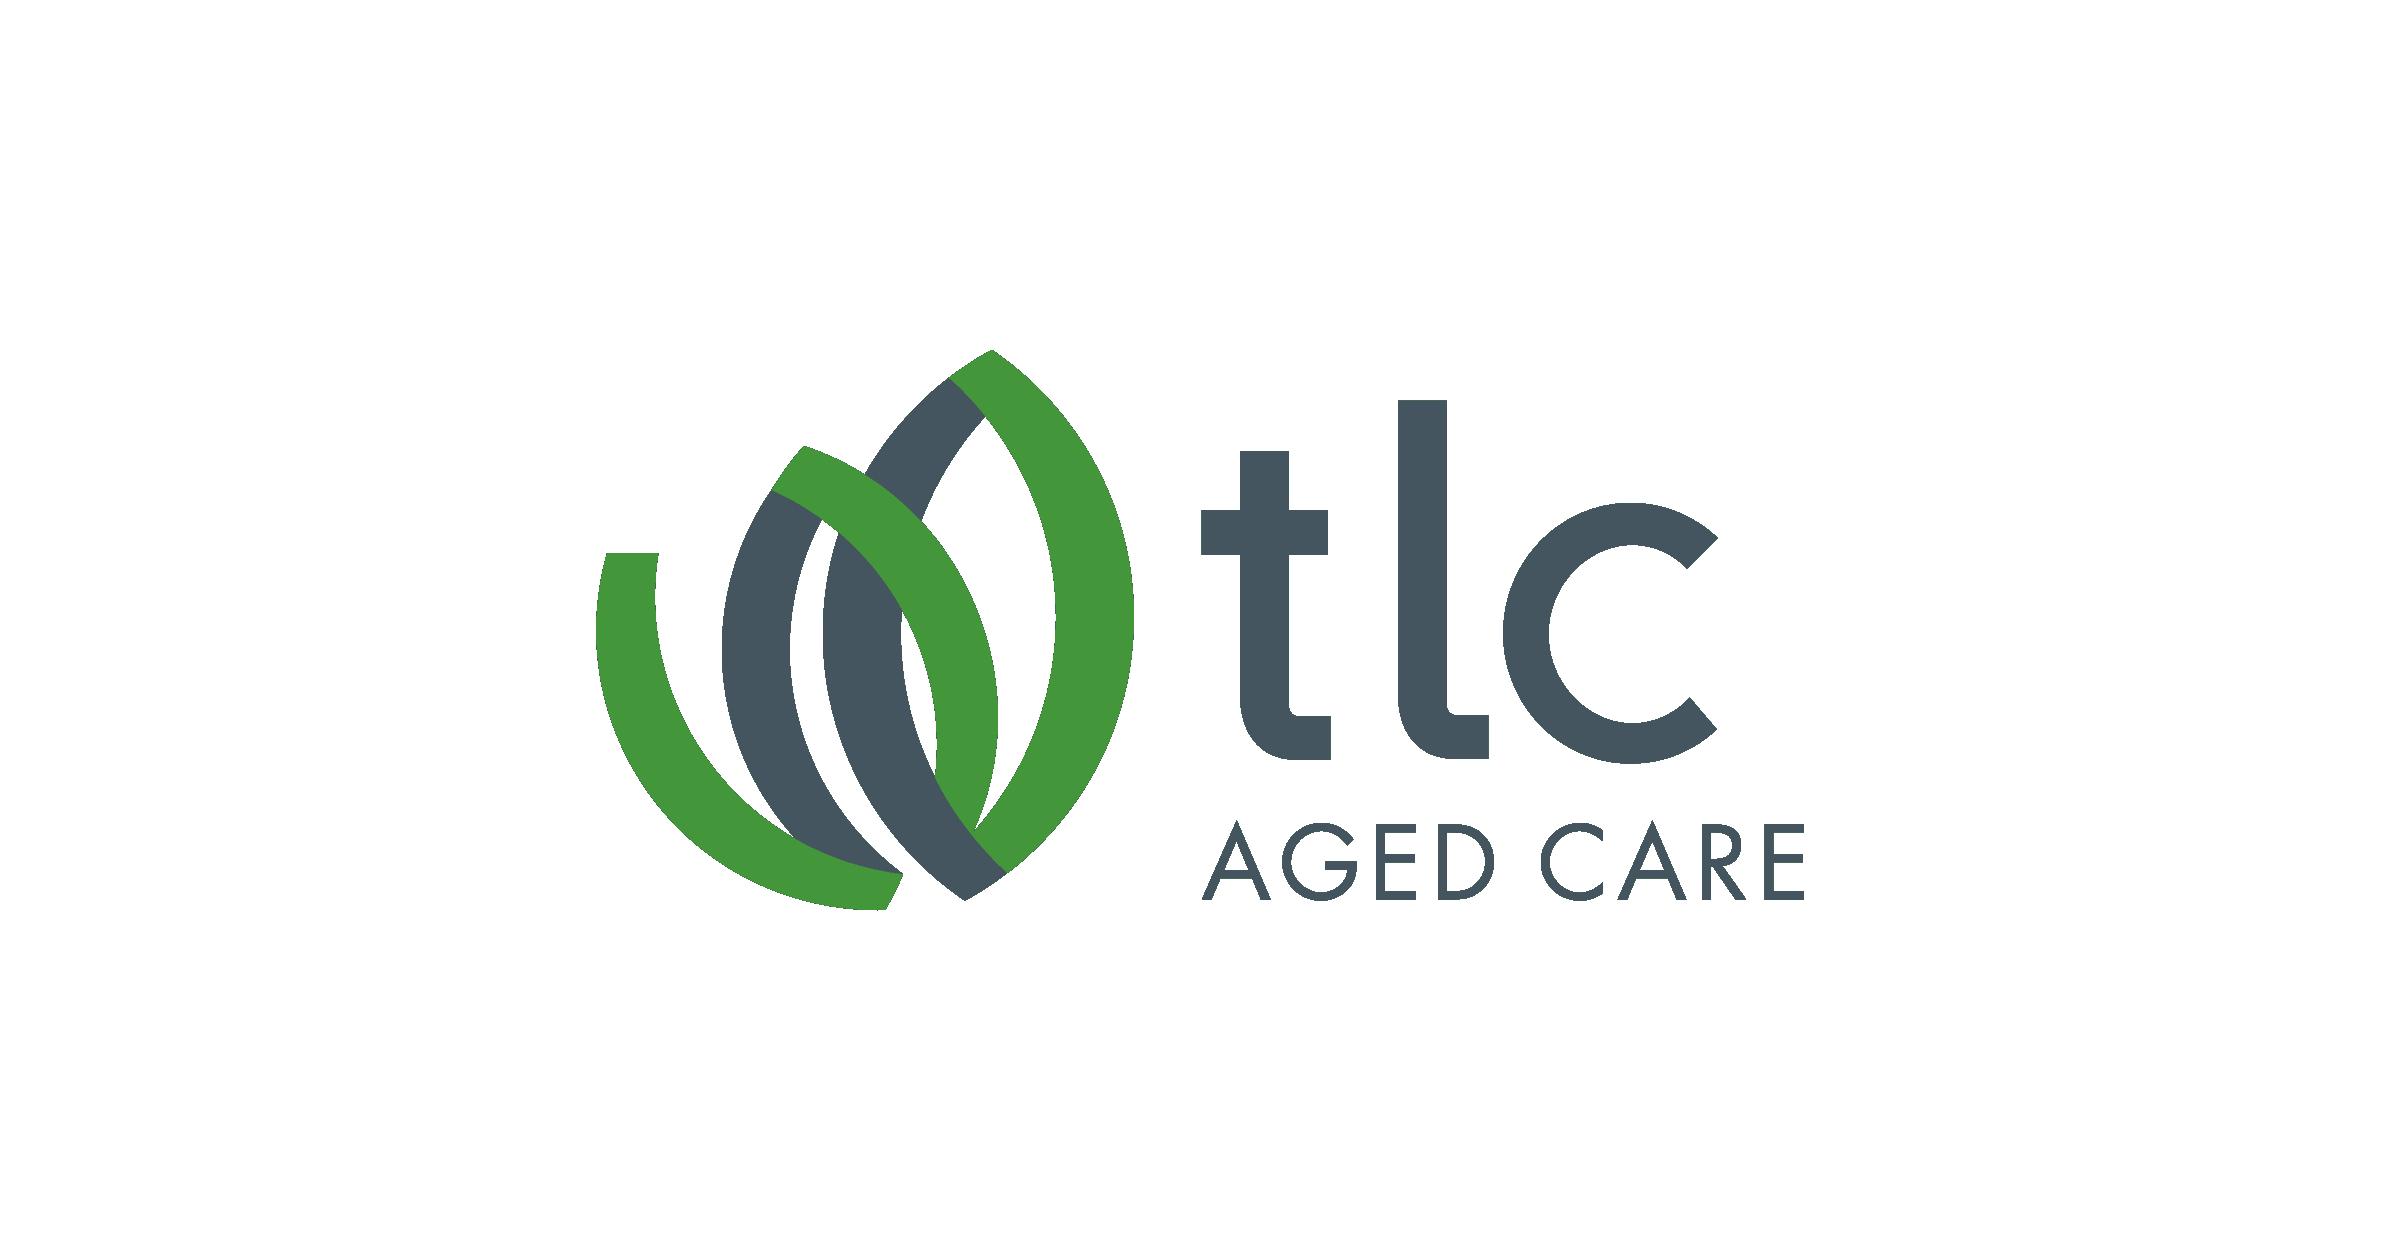 tlc aged care